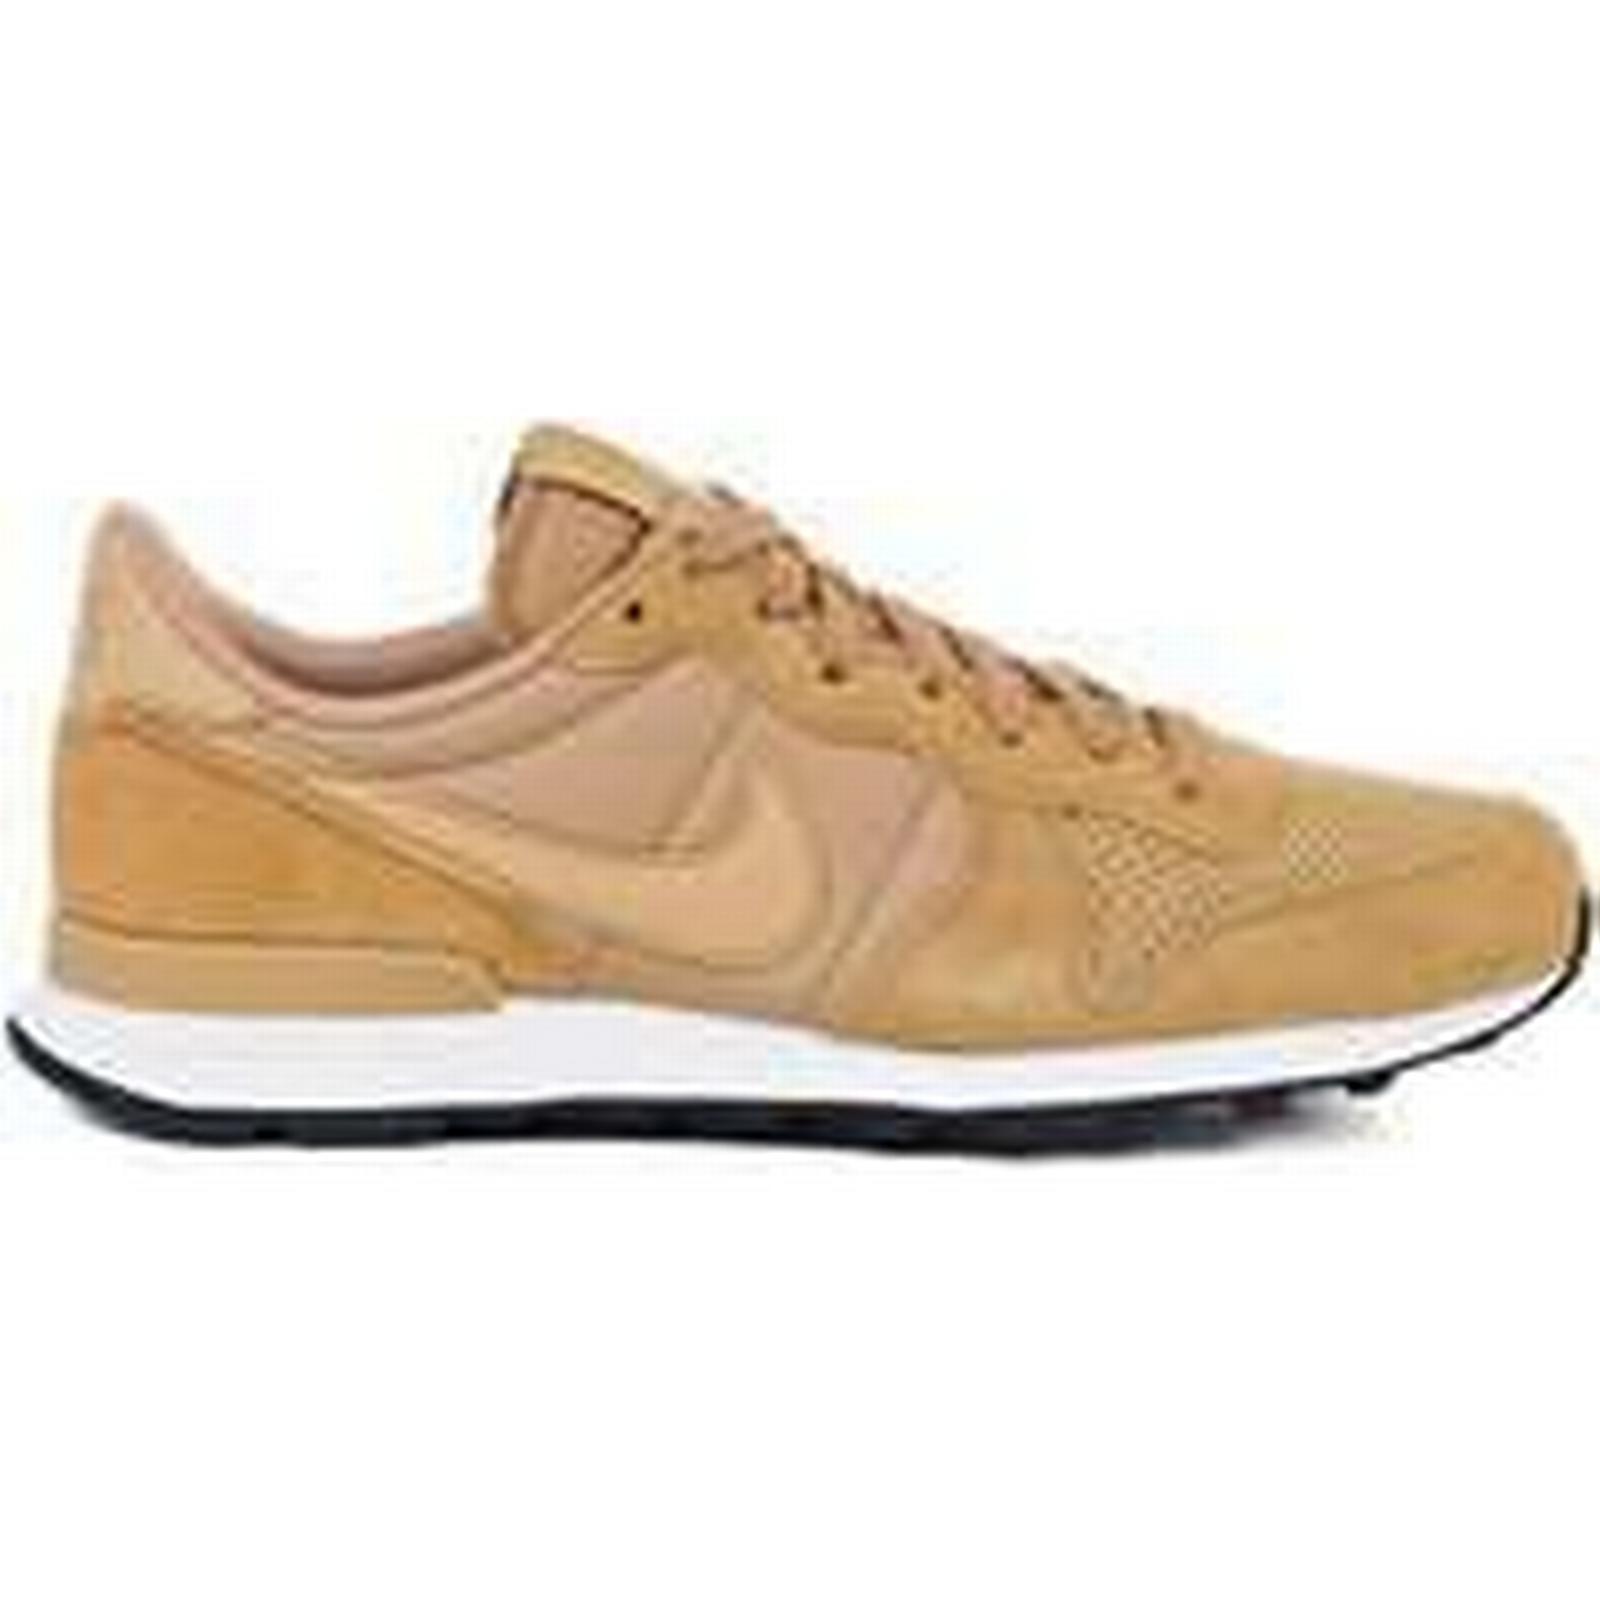 pretty nice 99eb8 bee69 Se Spartoo S Hommes Internationaliste amp  Nike co uk xZO8Cfq